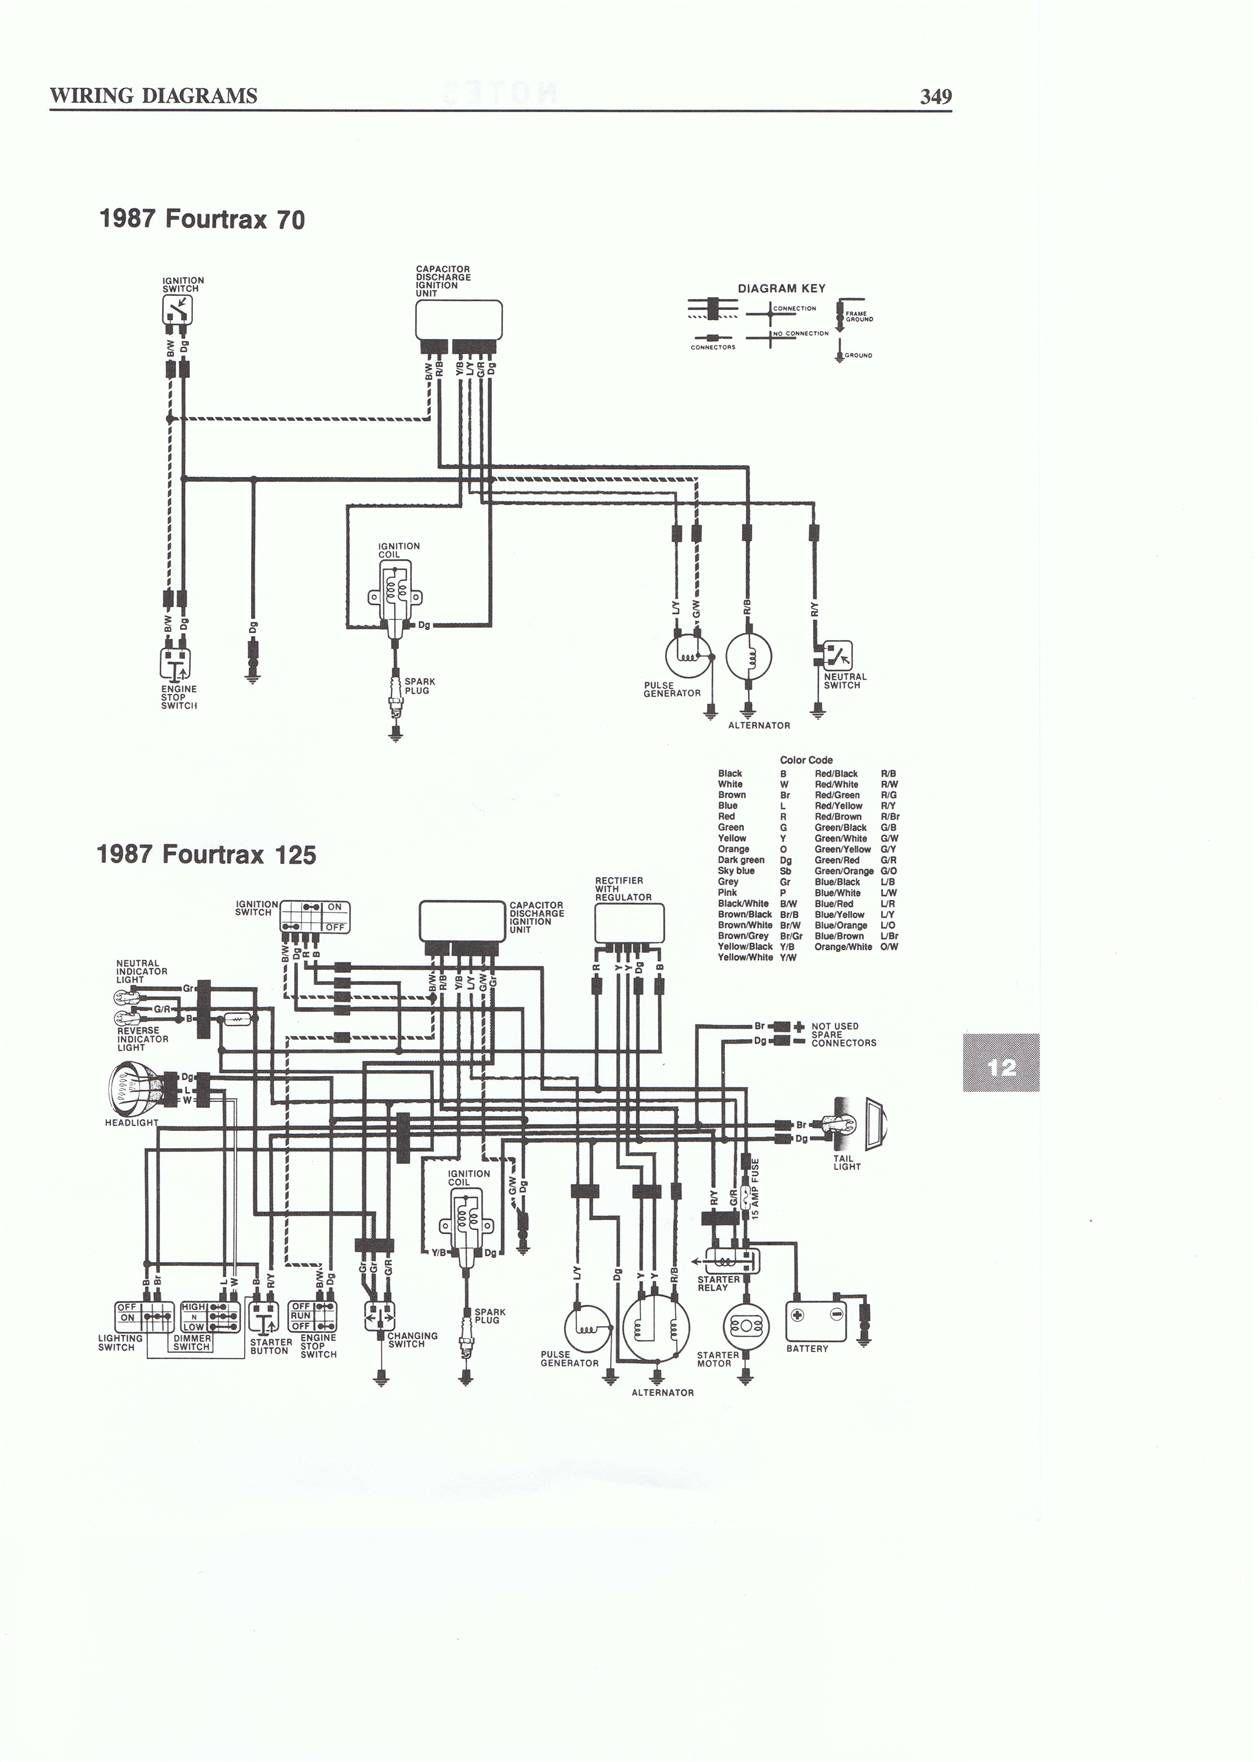 50cc moped wiring diagram headlights fc 7028  50cc chinese scooter wiring diagram also 50cc 2 stroke  50cc chinese scooter wiring diagram